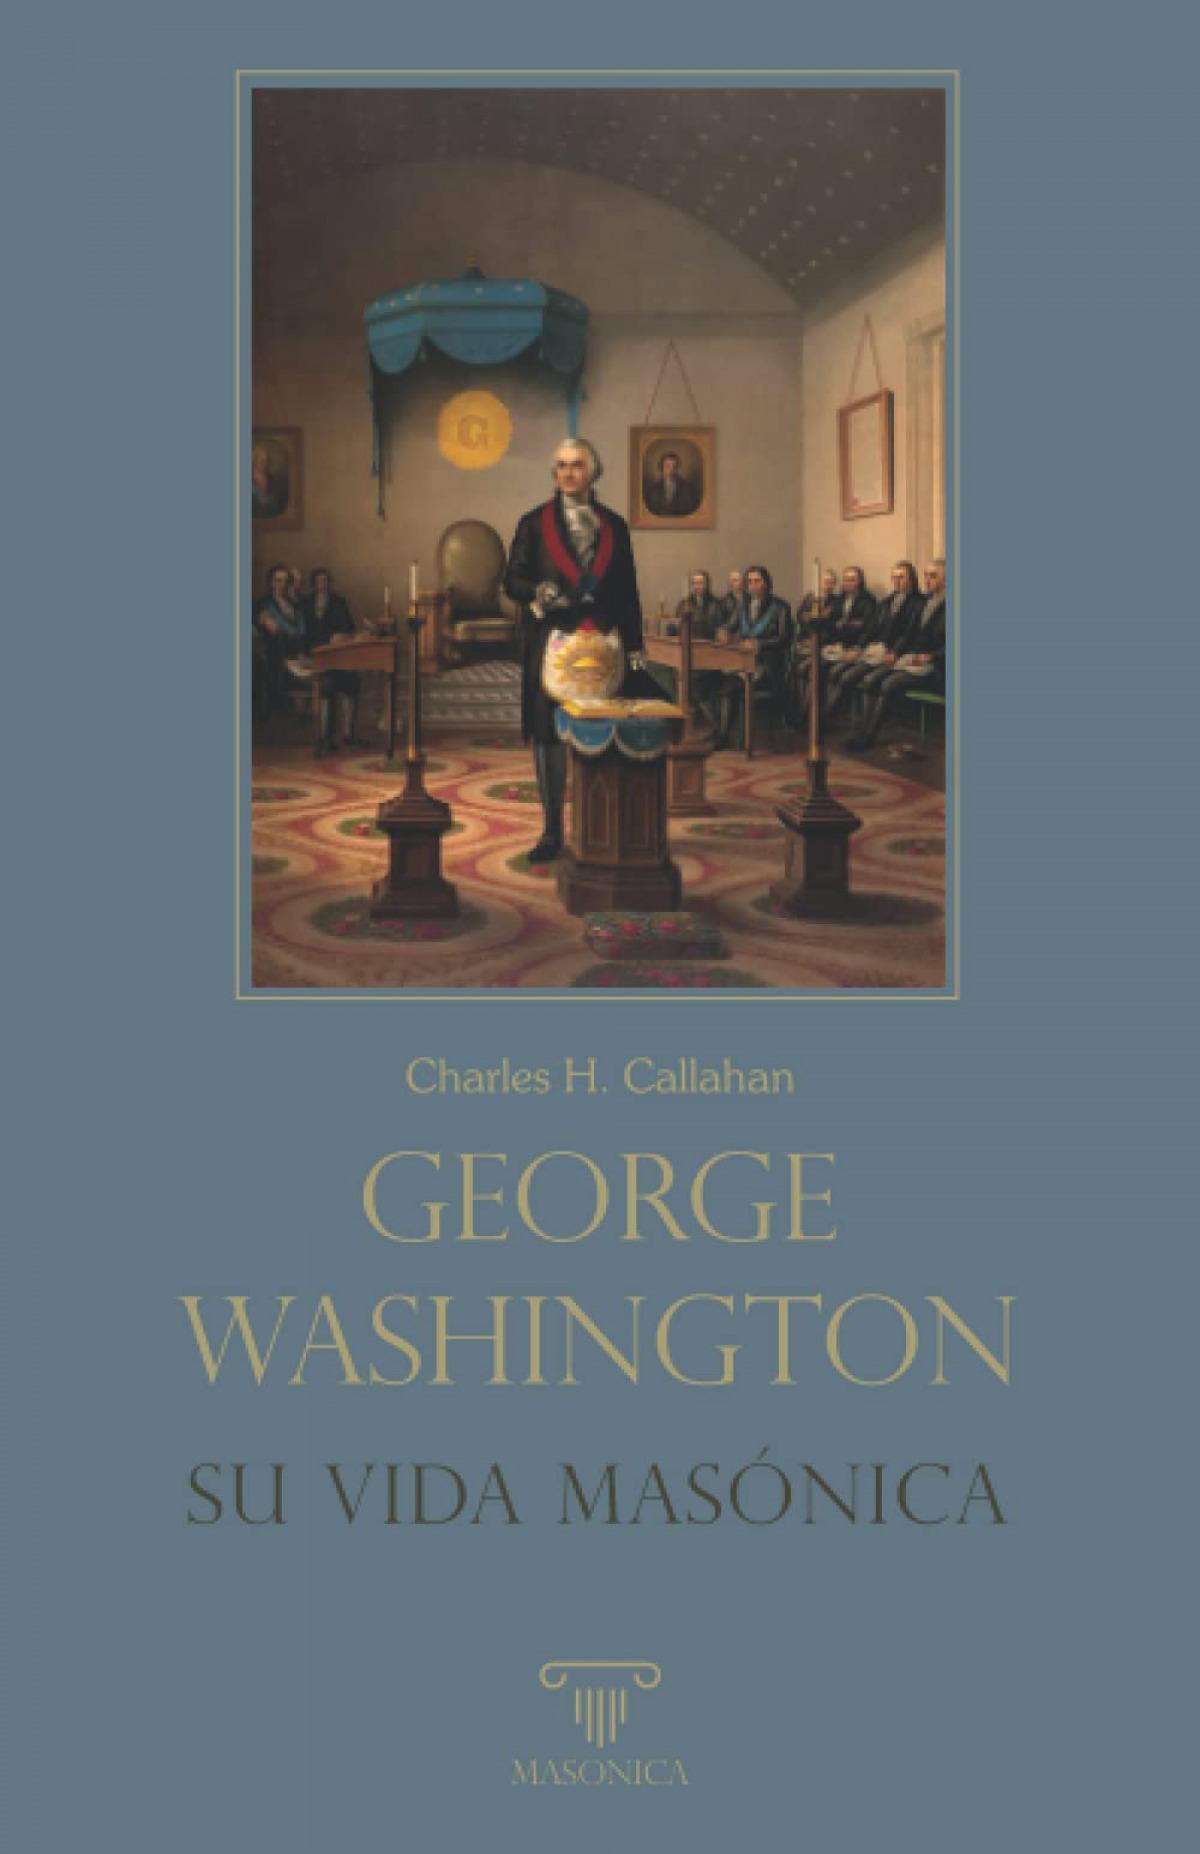 George Washington. Su vida masónica